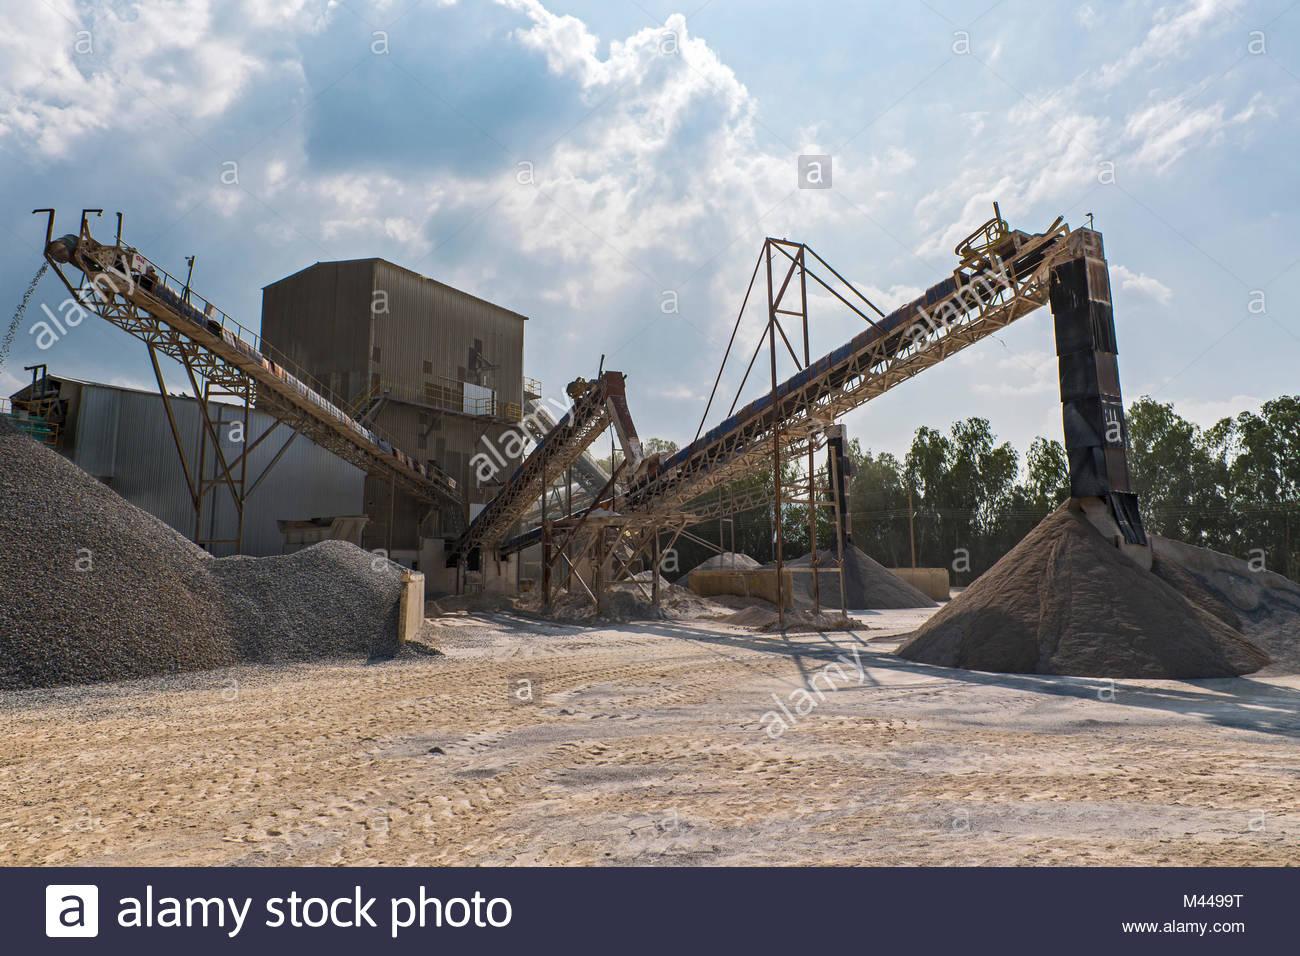 Crusher and conveyor belts at gravel mine, Pak Chong, Nakhon Ratchasima, Thailand, Asia - Stock Image